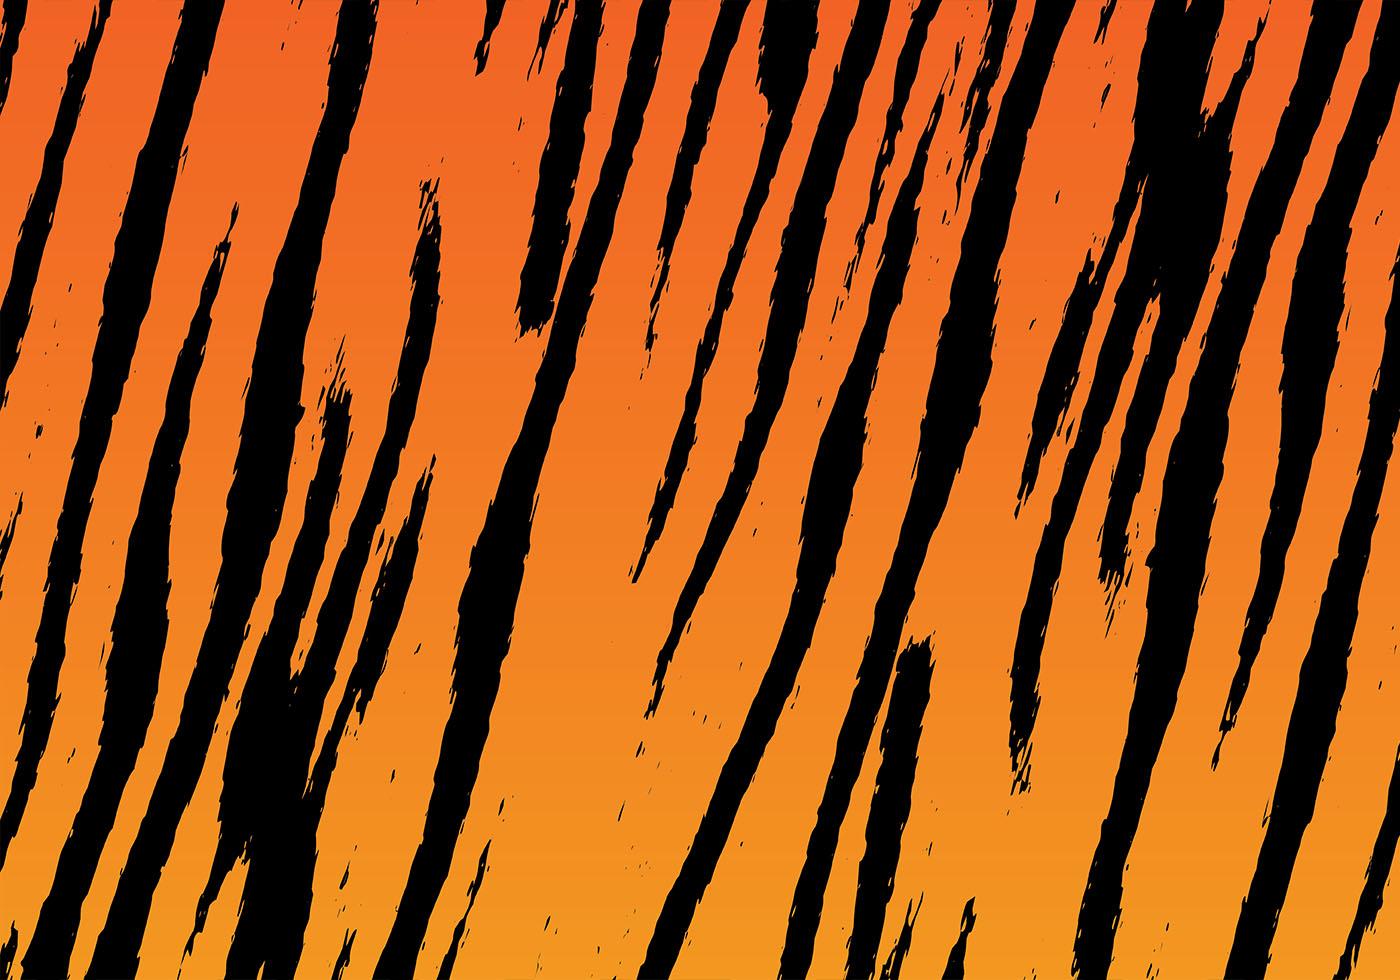 tiger stripe background vector download free vector art zebra print vector free Zebra Print Wall Art